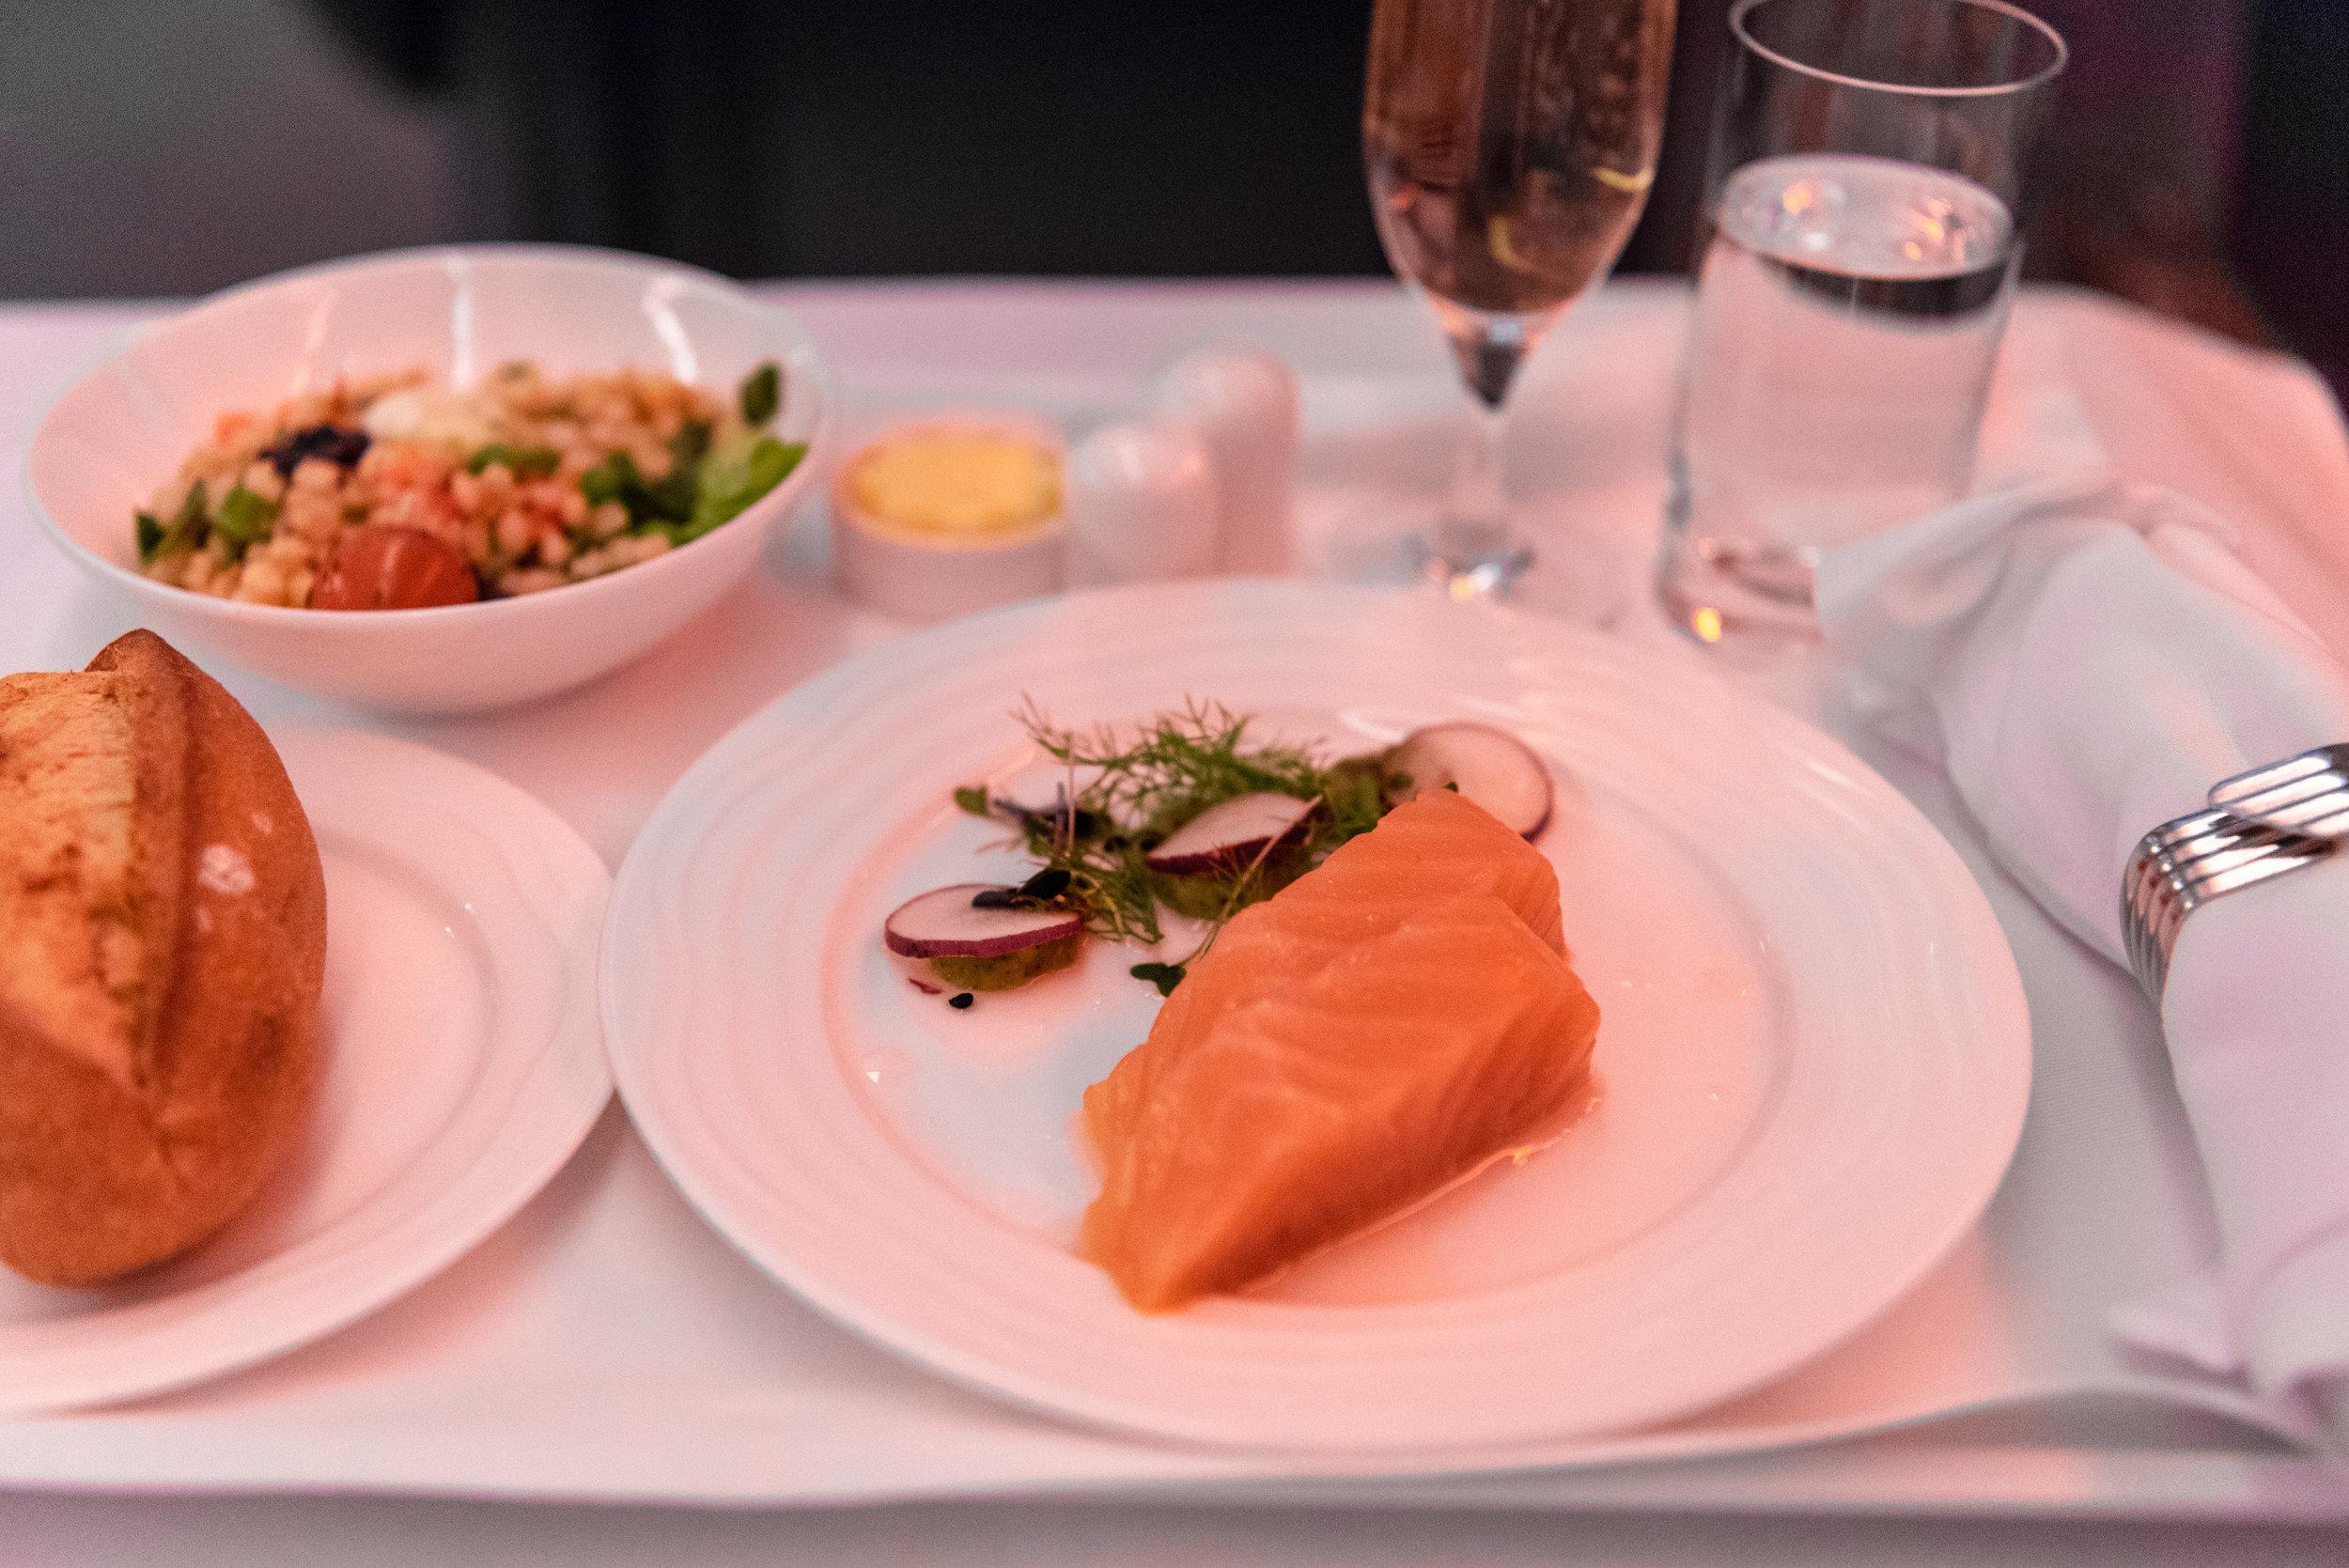 Smoked Salmon   Emirates EK352 Business Class 777-300ER - DXB to SIN